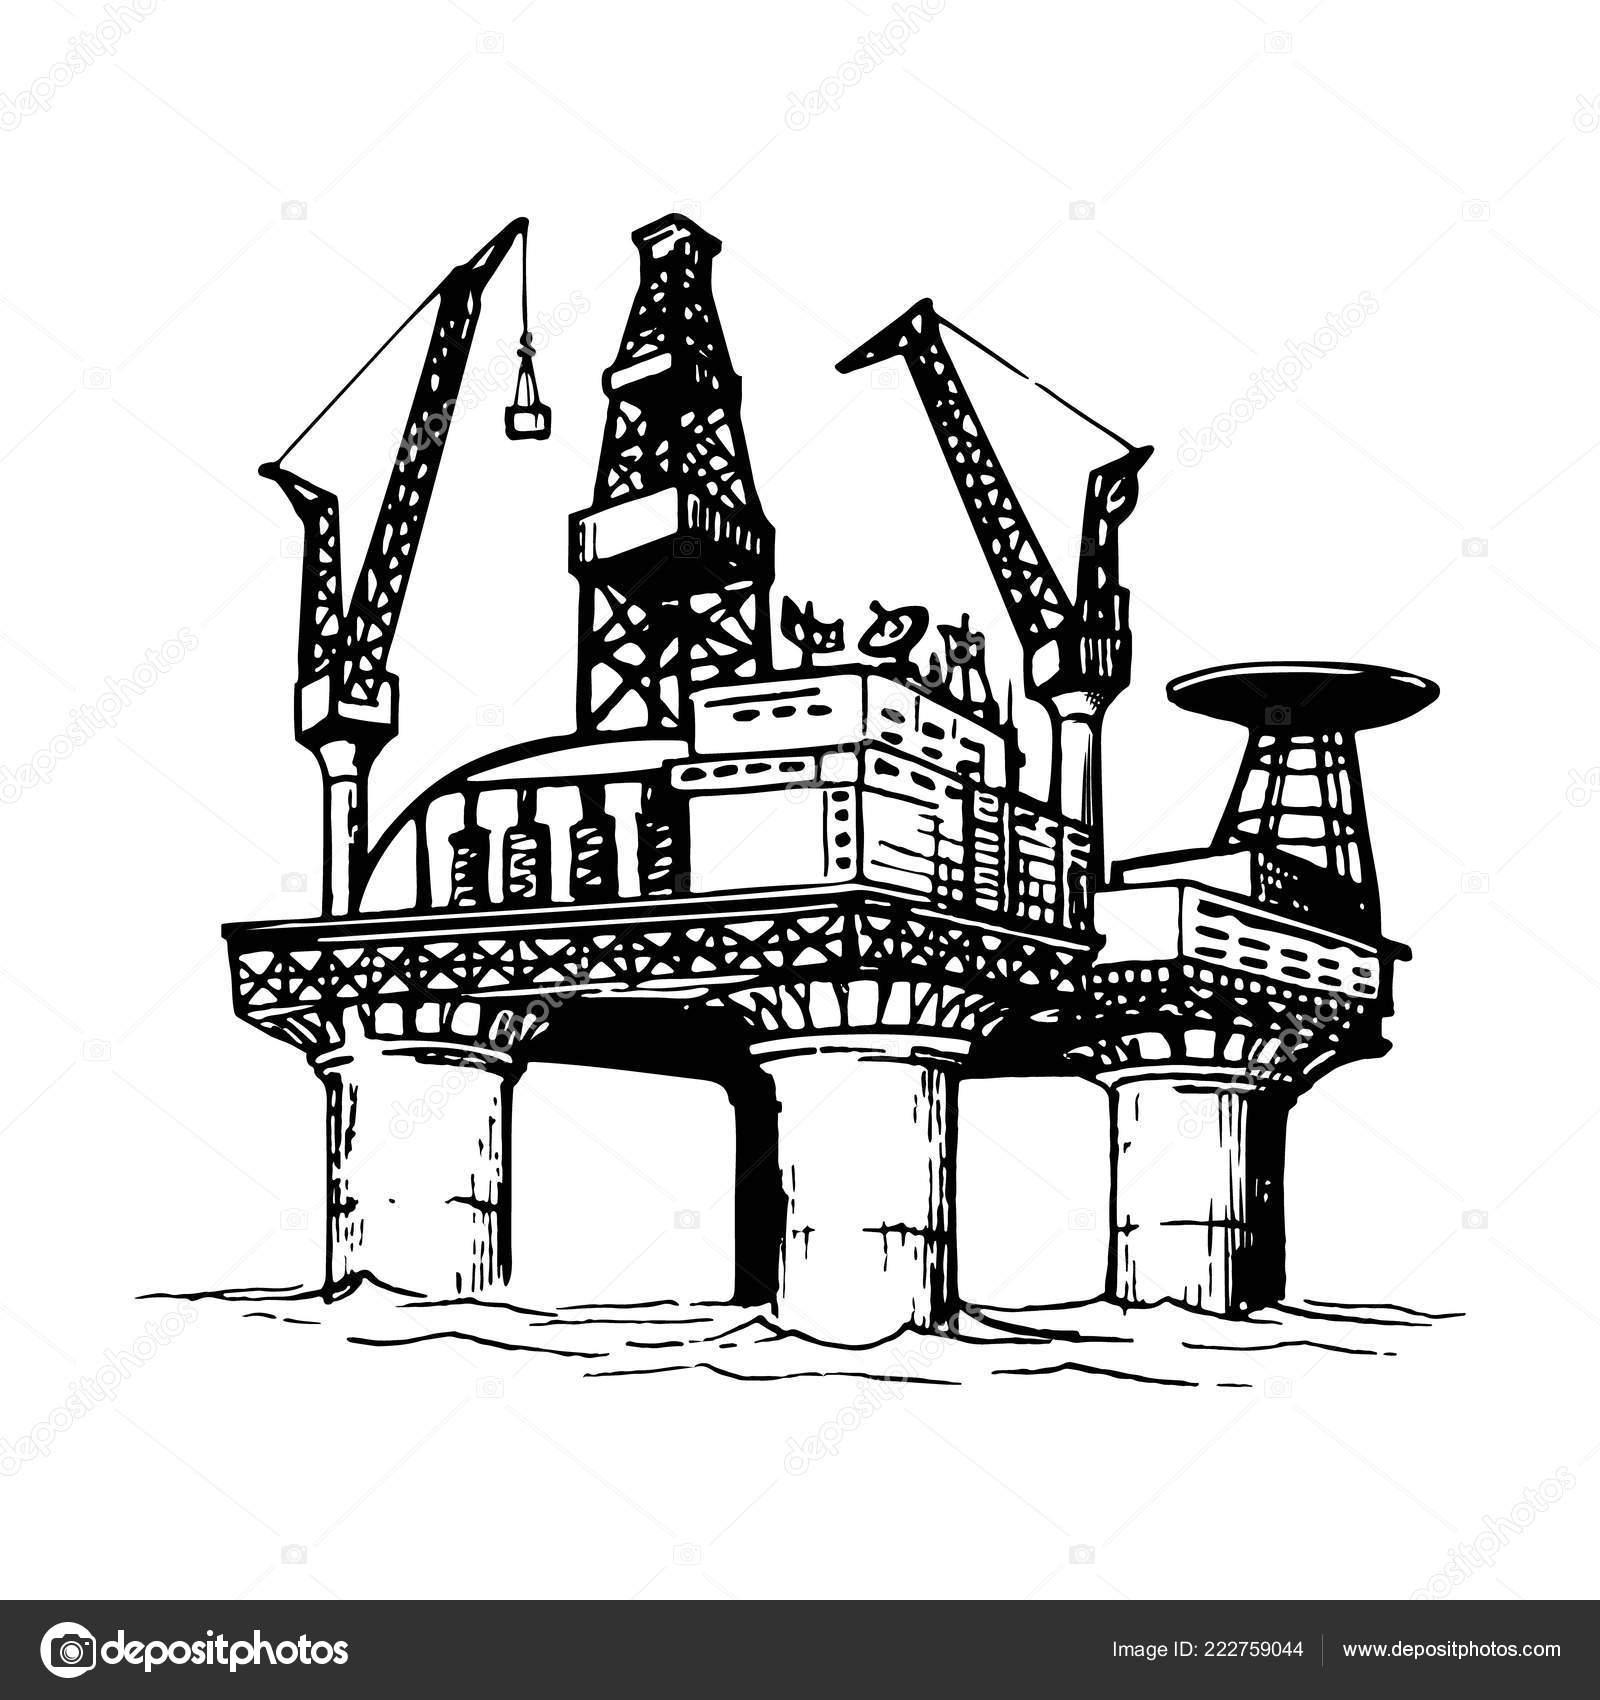 Oil rig drawing | Offshore oil drilling platform  Sketch